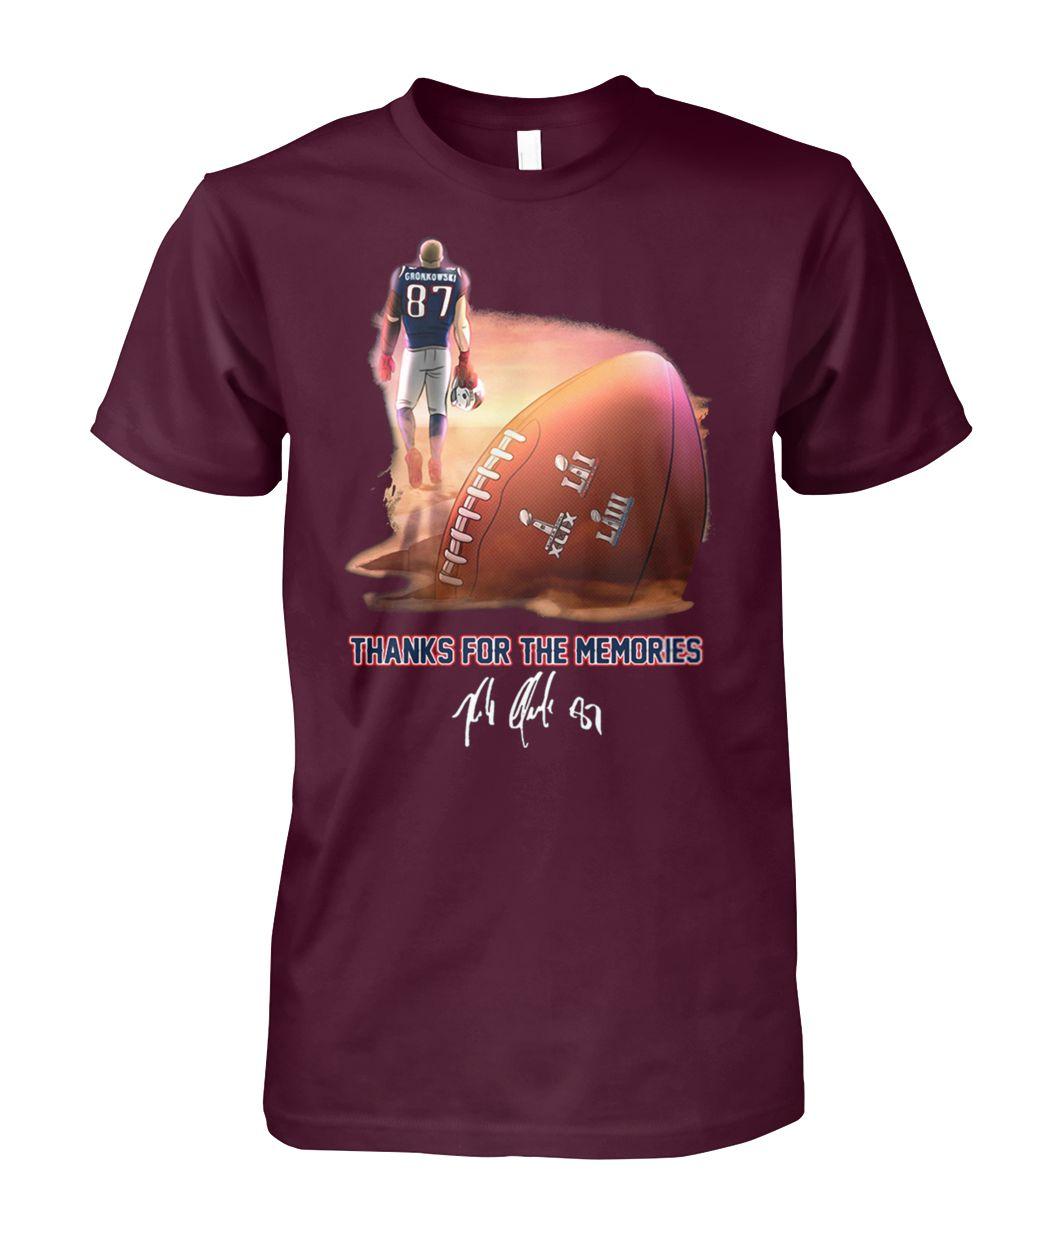 [Hot version] NFL rob gronkowski 87 thanks for the memories shirt